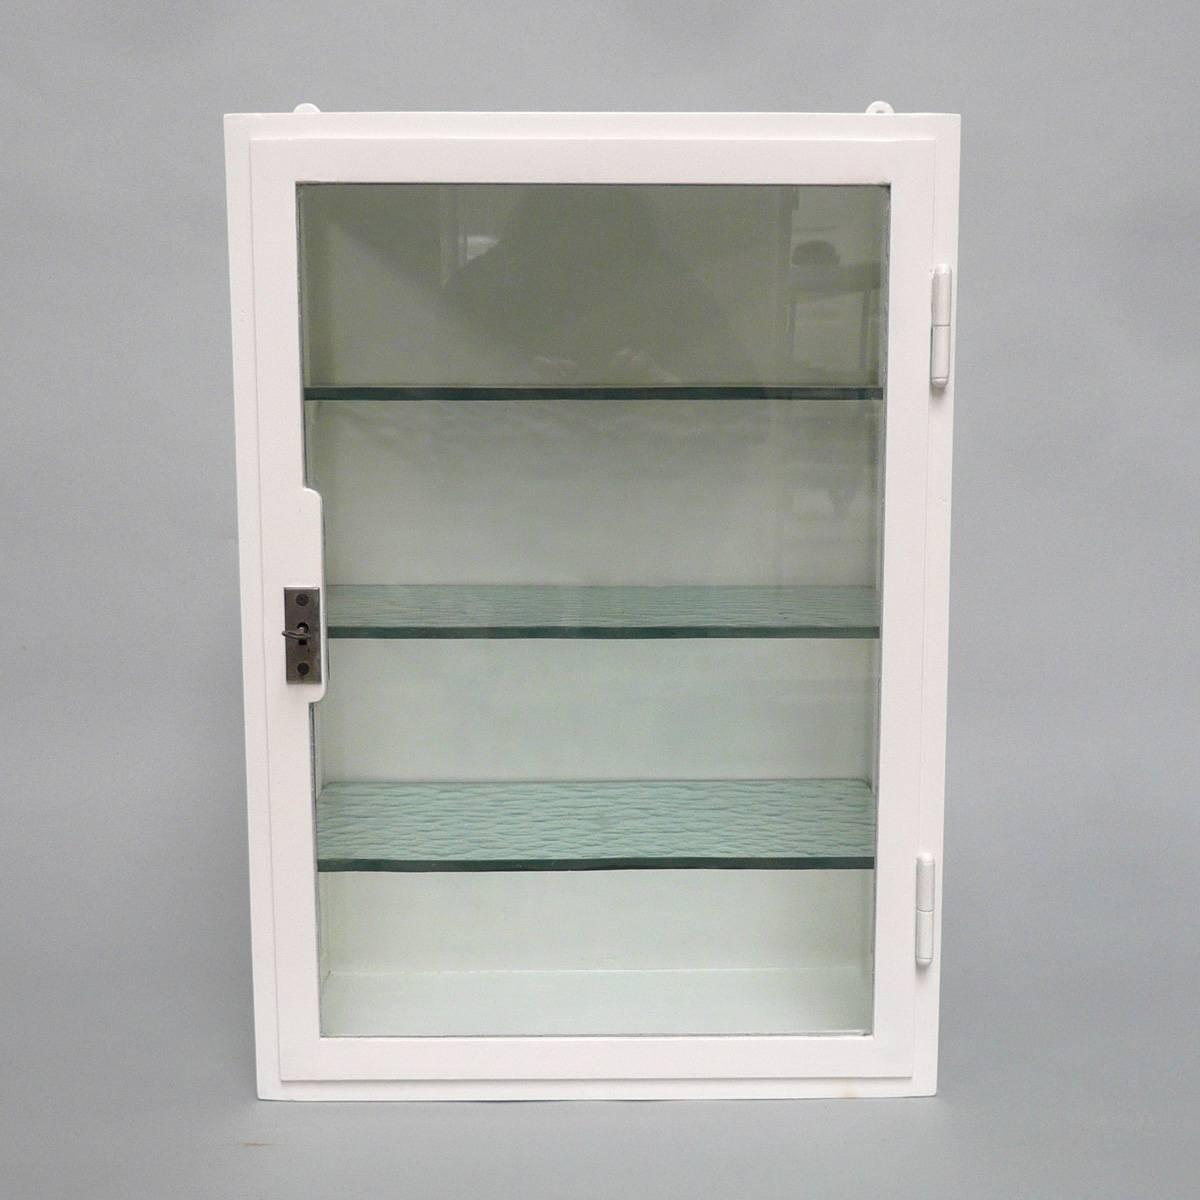 Vintage style medicine cabinets